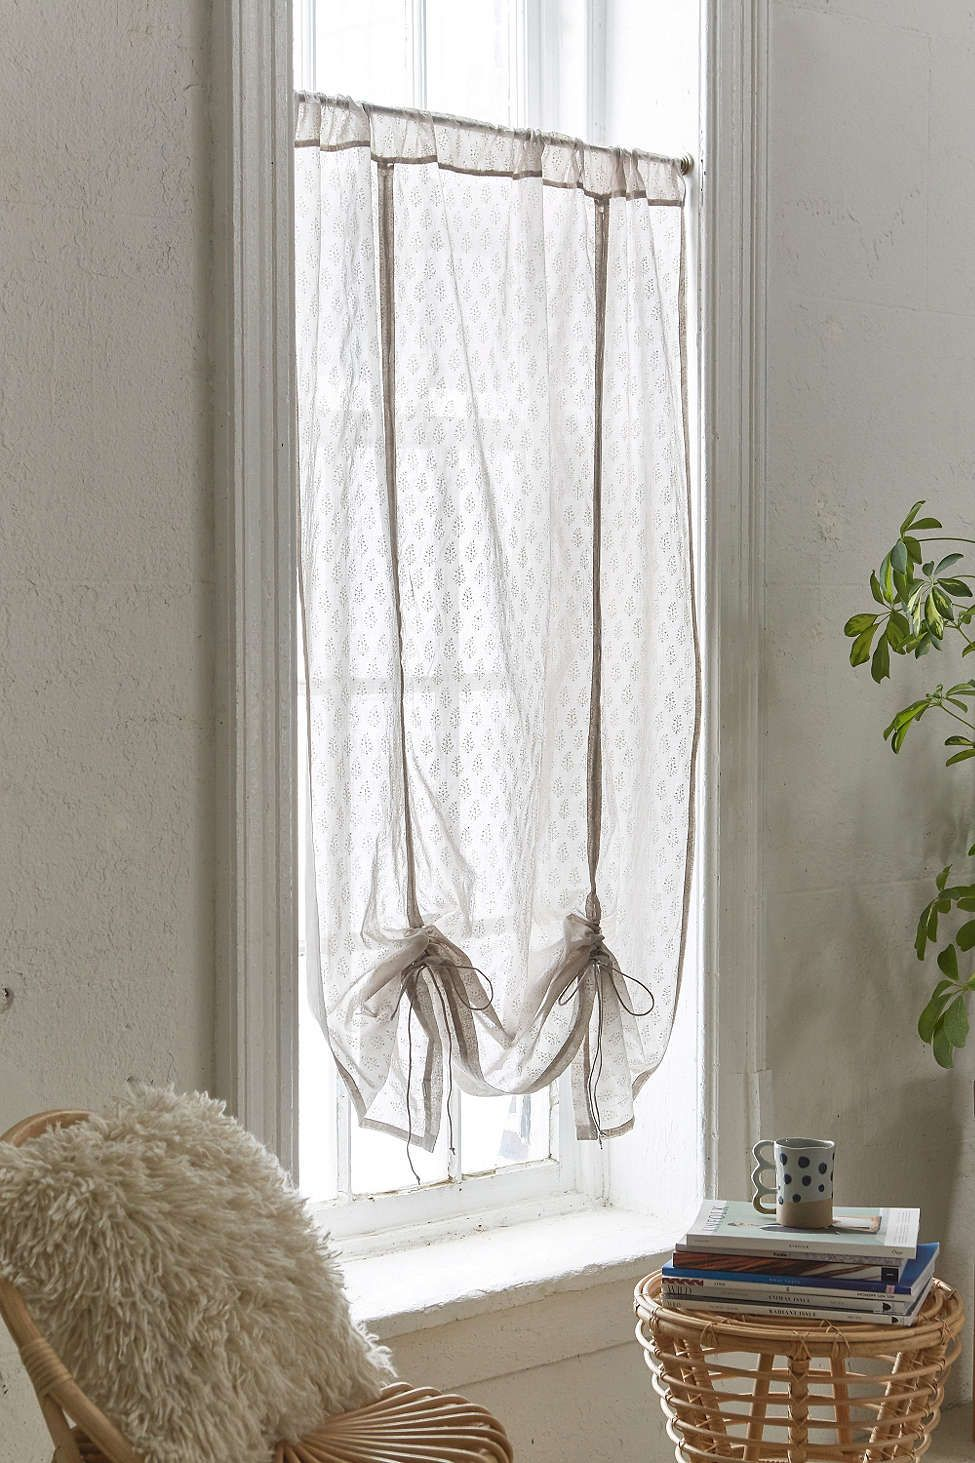 Window decor for bedroom  plum u bow carlie bhuti drape shade  urban outfitters  bedroom